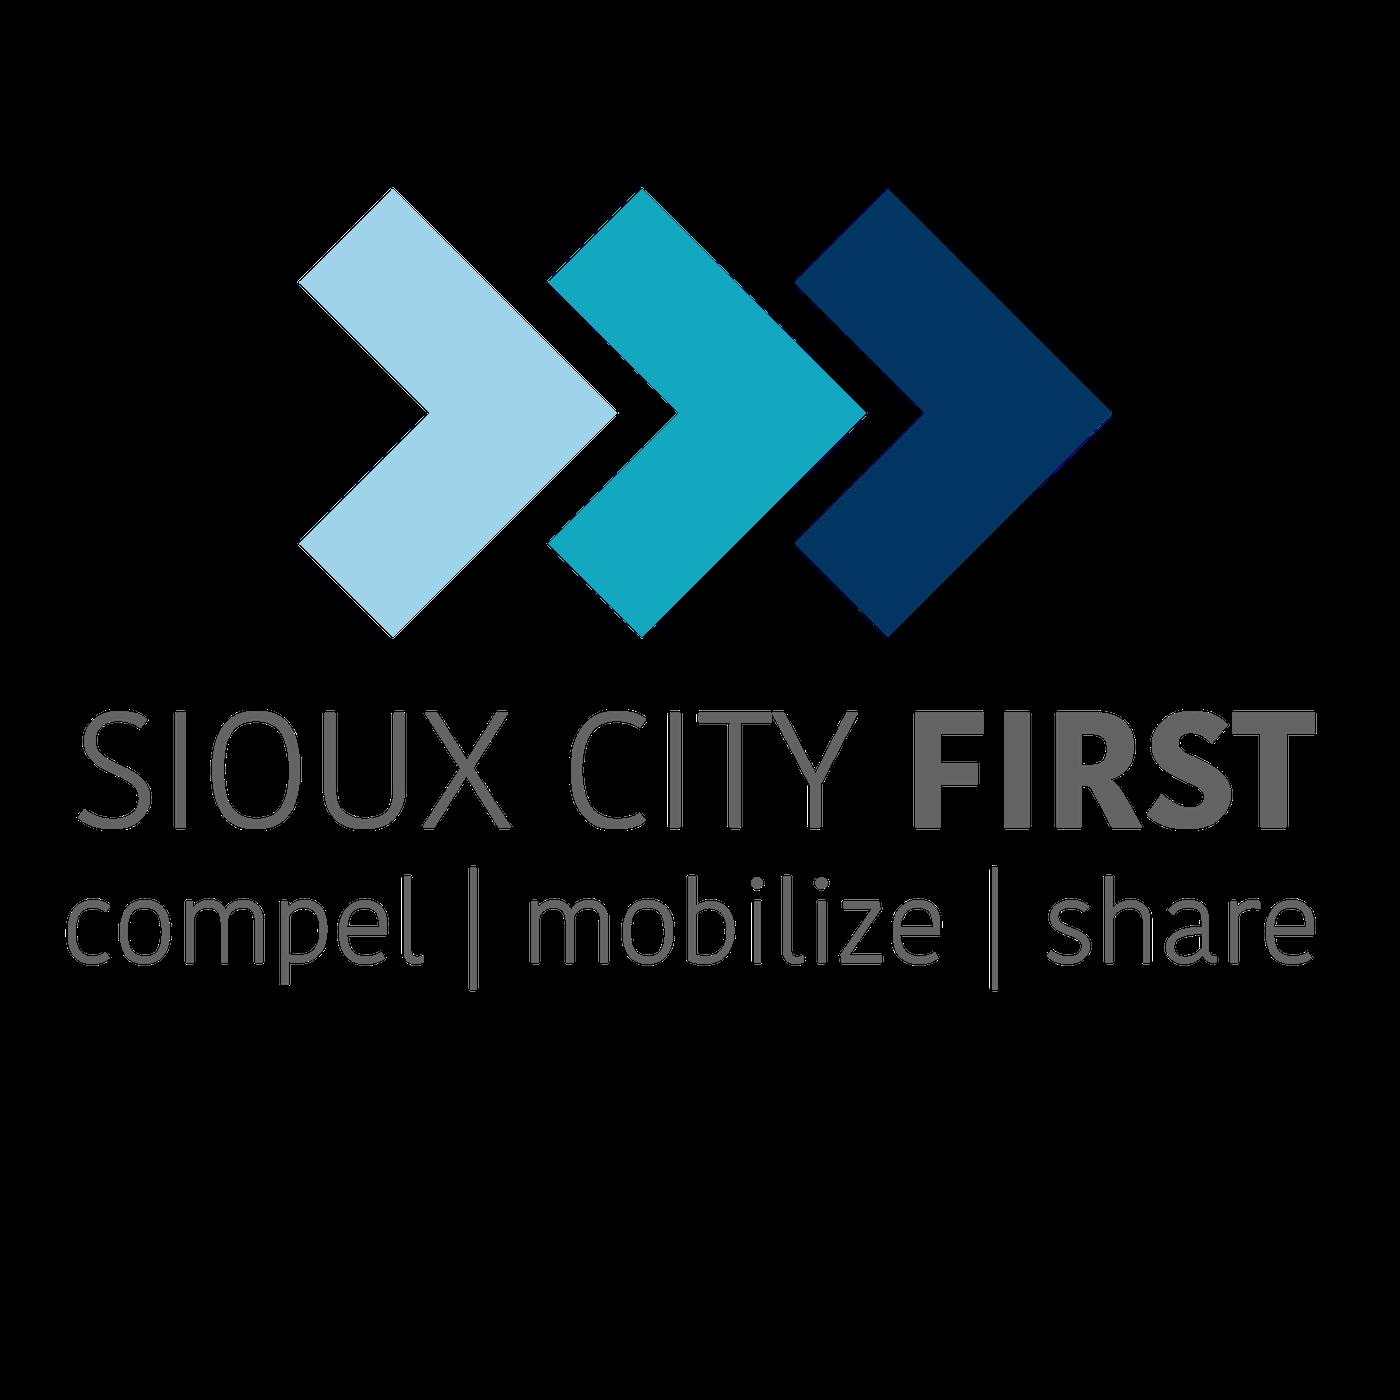 SiouxCityFIRST